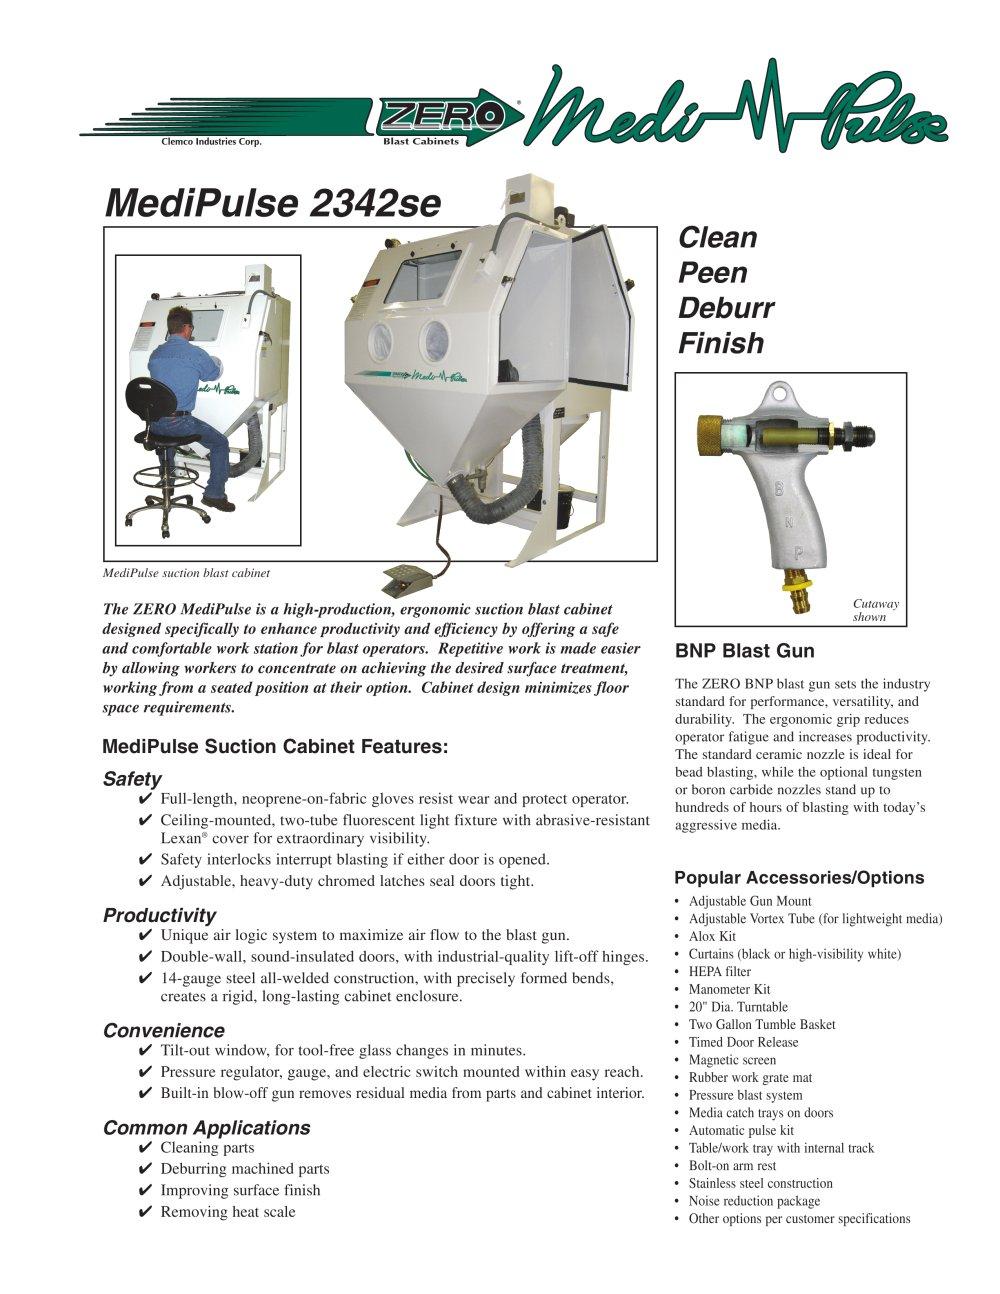 Clemco Industries Blast Cabinets Medipulse 2342se Suction Blast Cabinet Clemco Industries Pdf